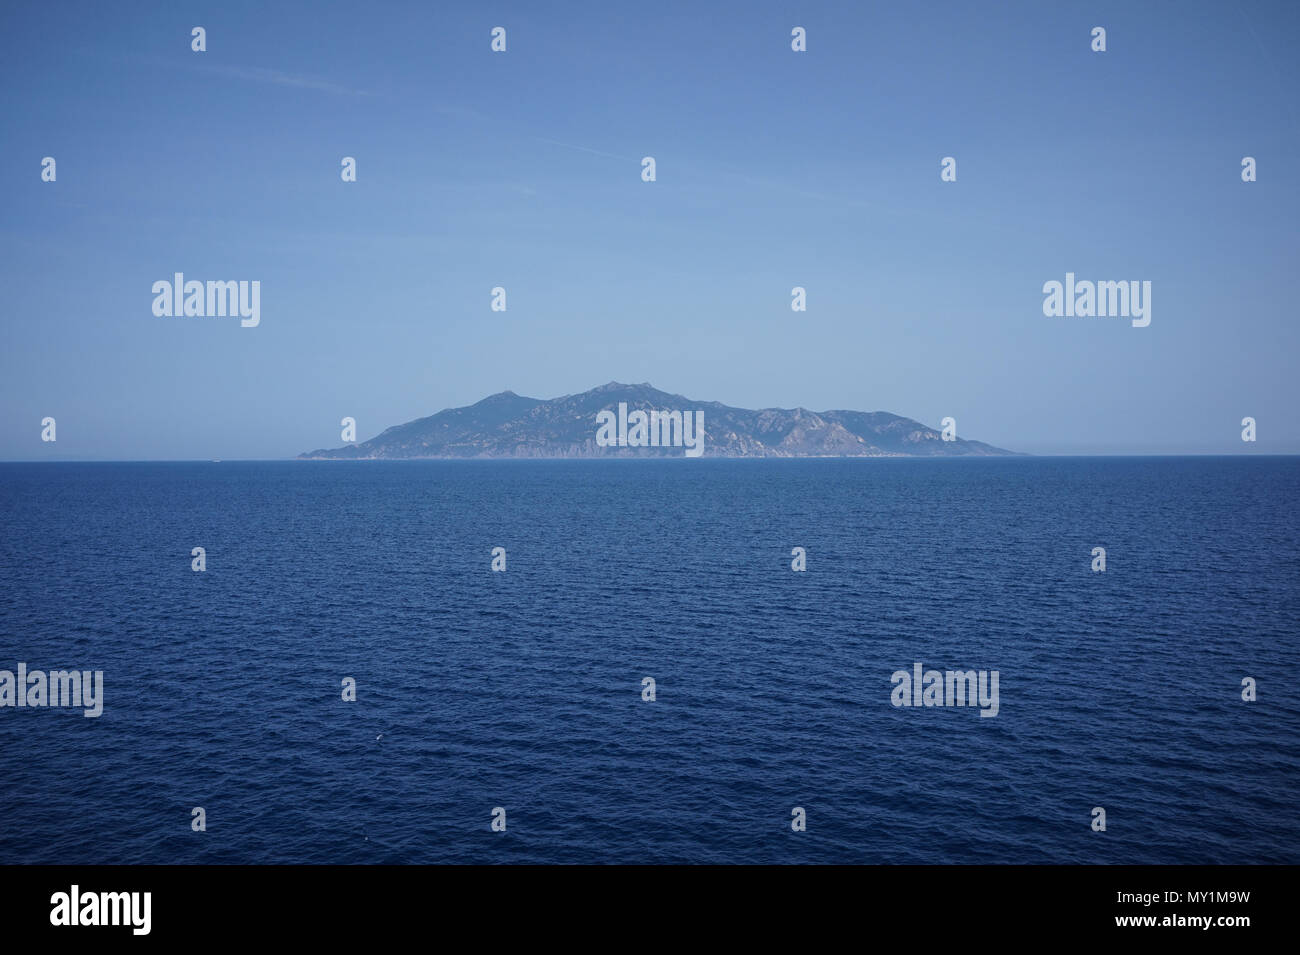 Capraia island seen from the sea - Stock Image